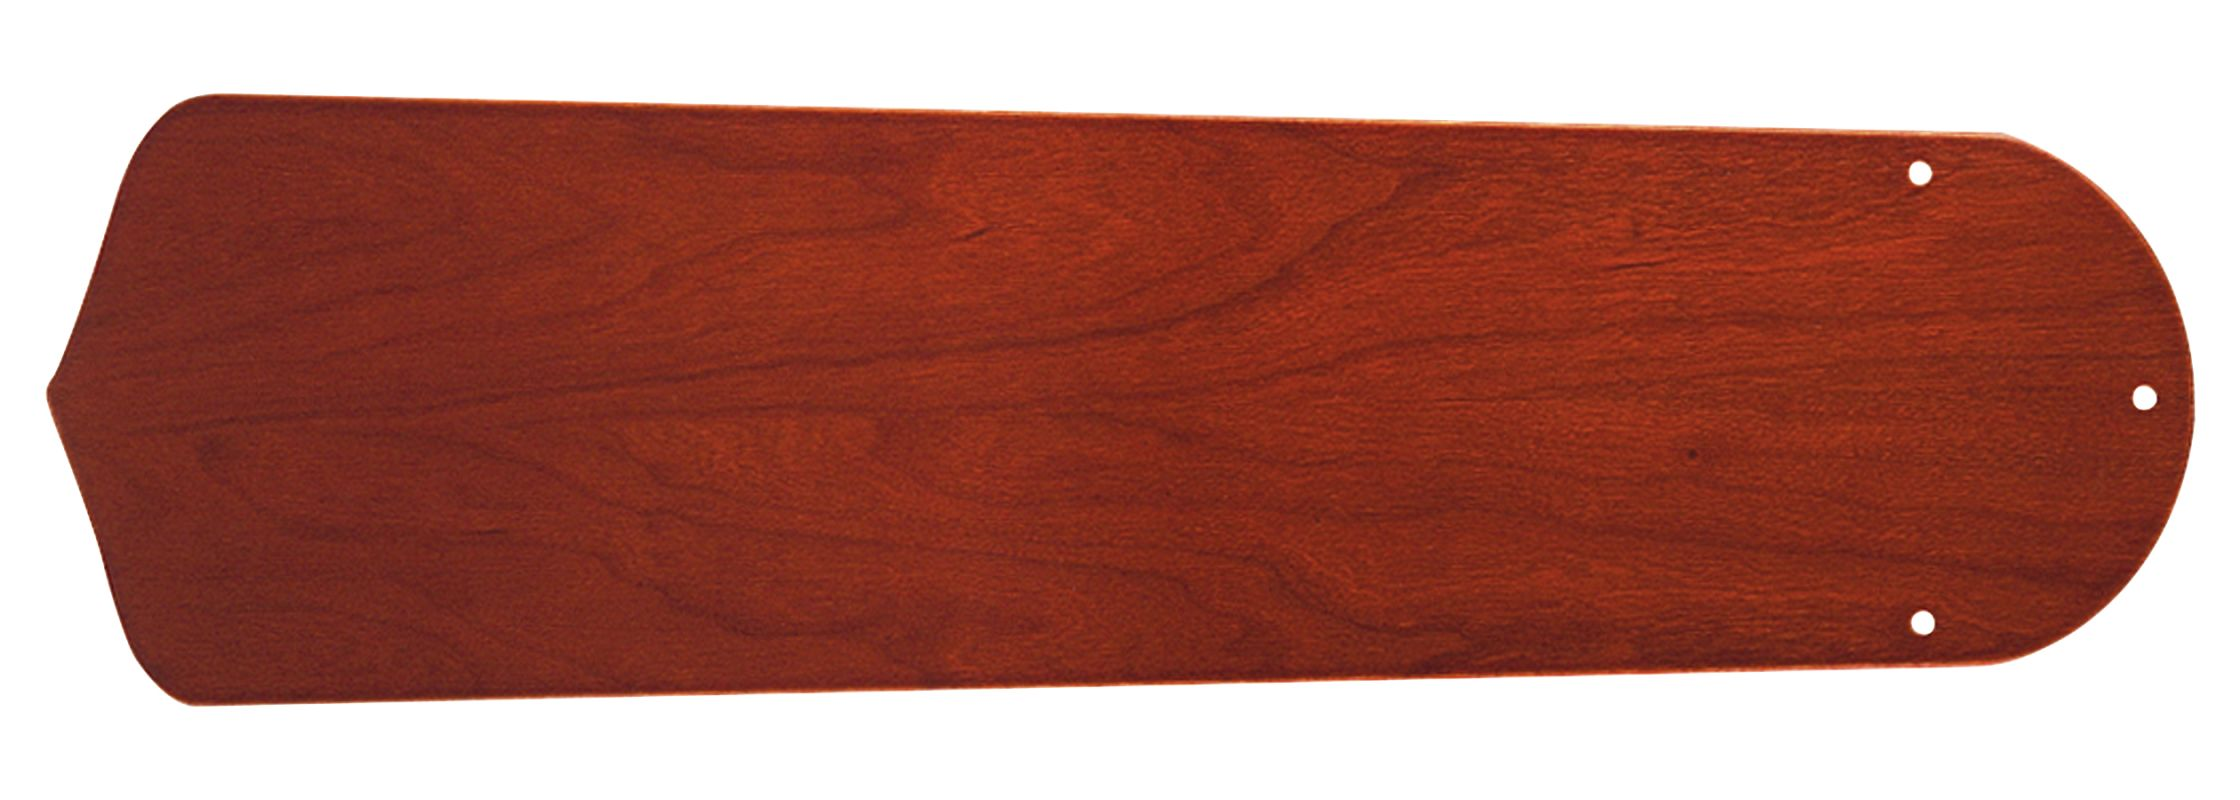 "Craftmade B552S Custom Wood 52"" (Pack of 5) Cherry Ceiling Fan"